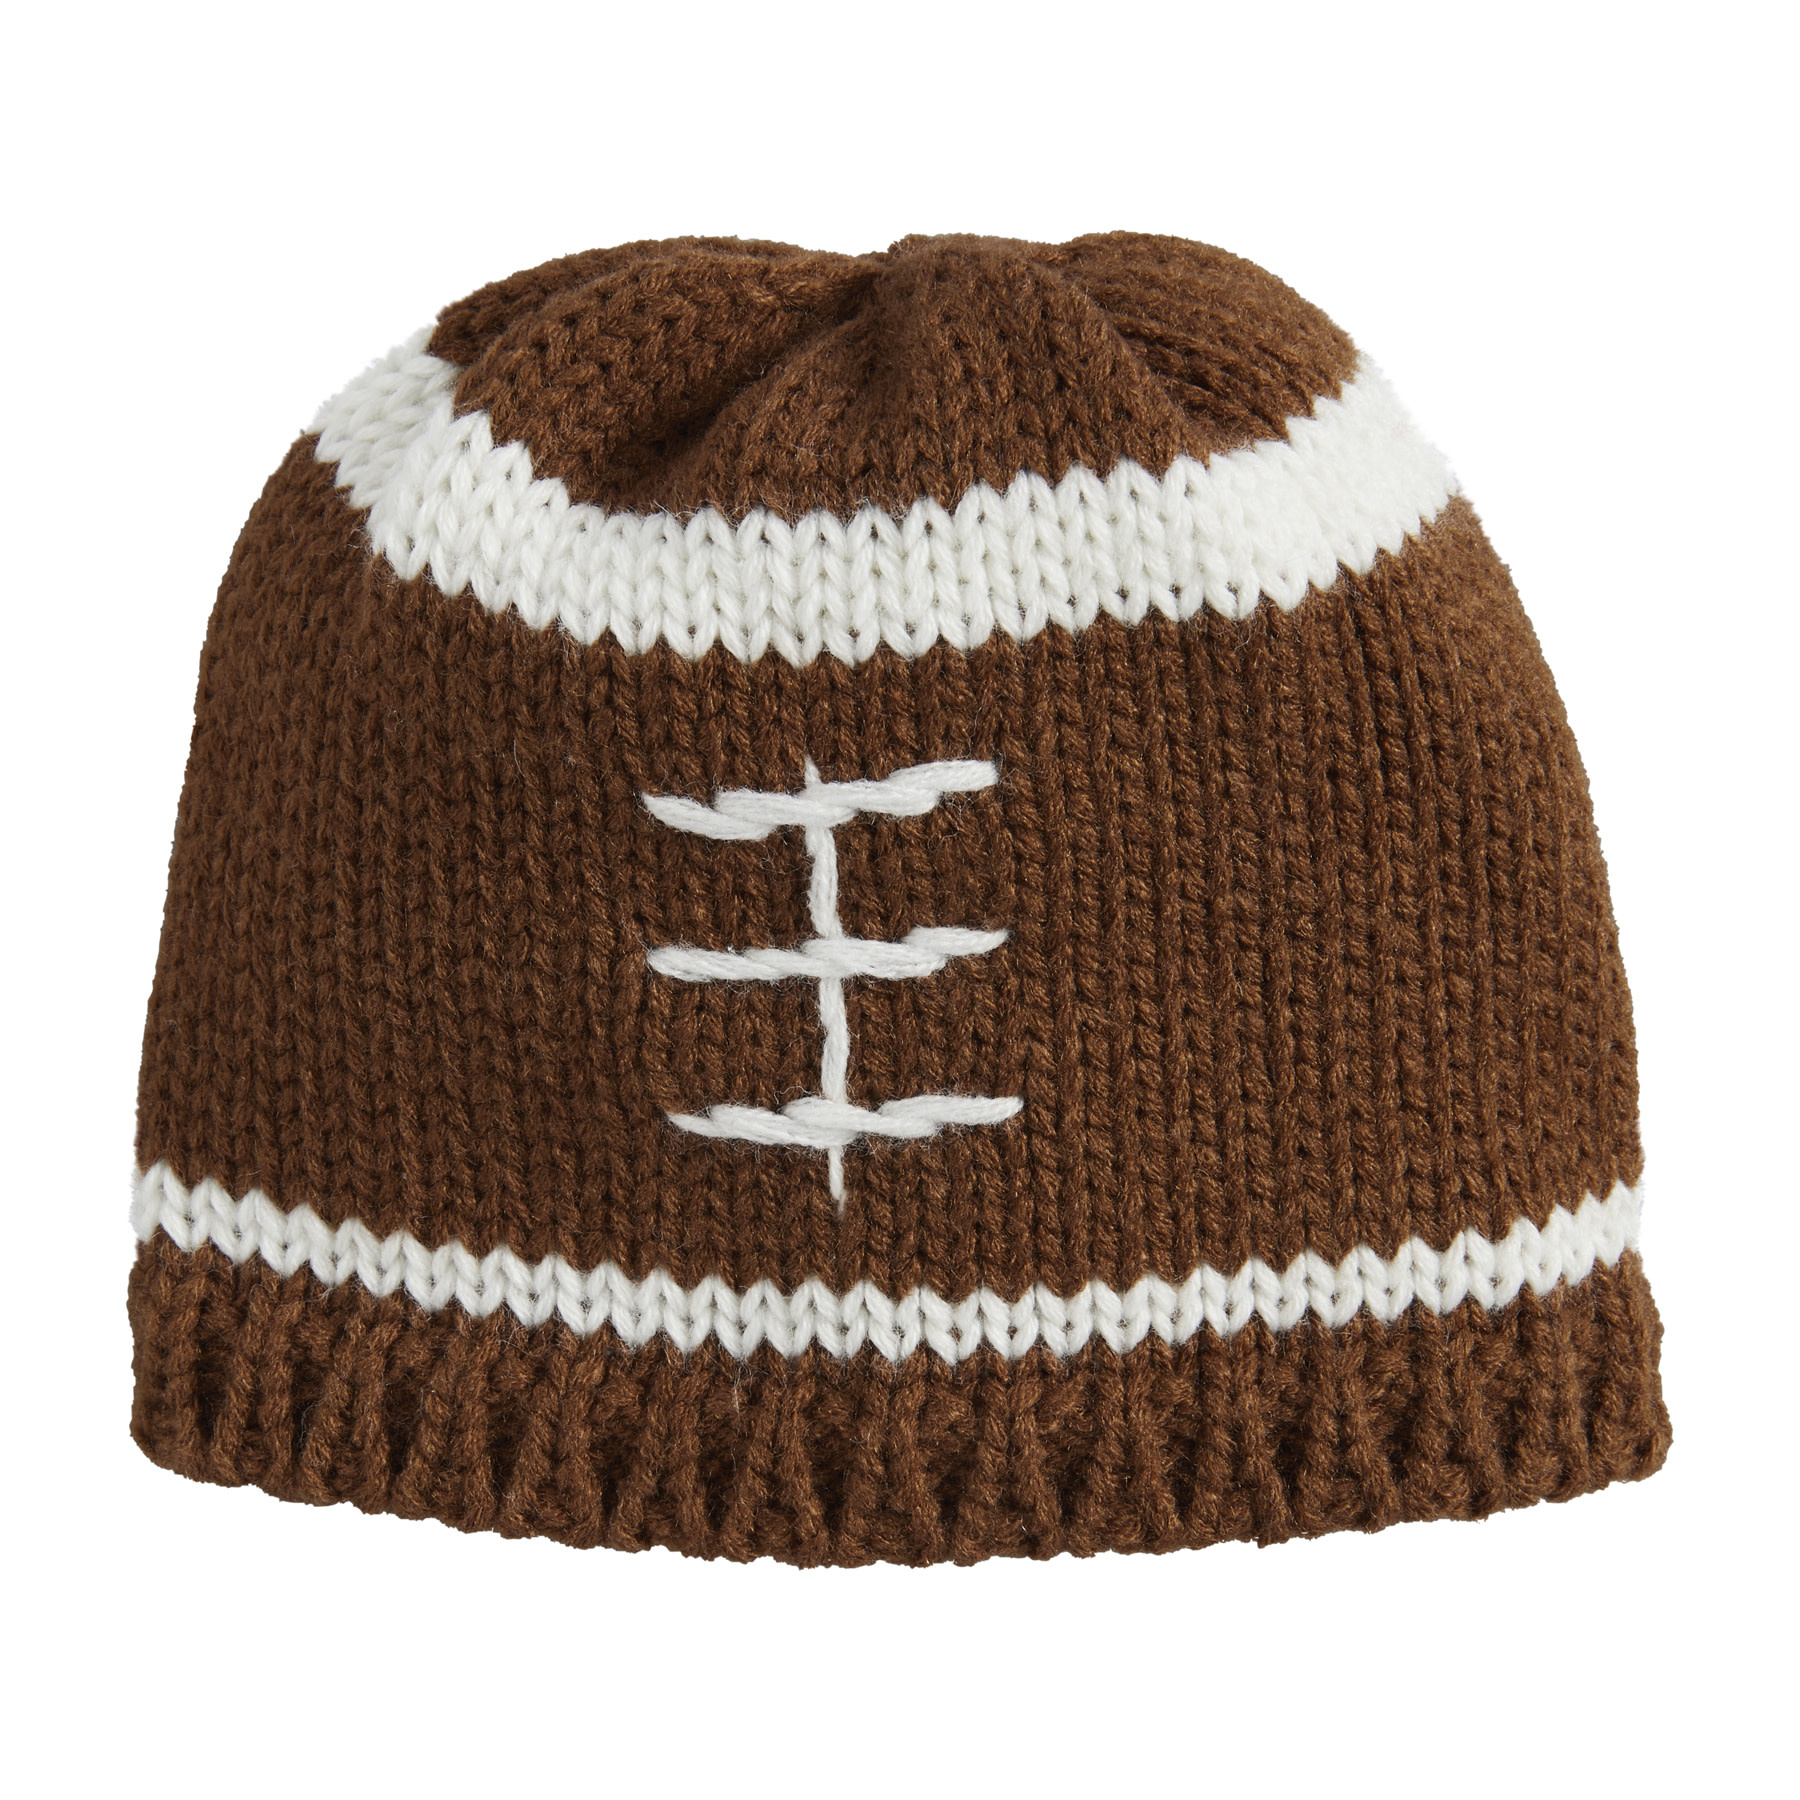 Mud Pie Football Hat